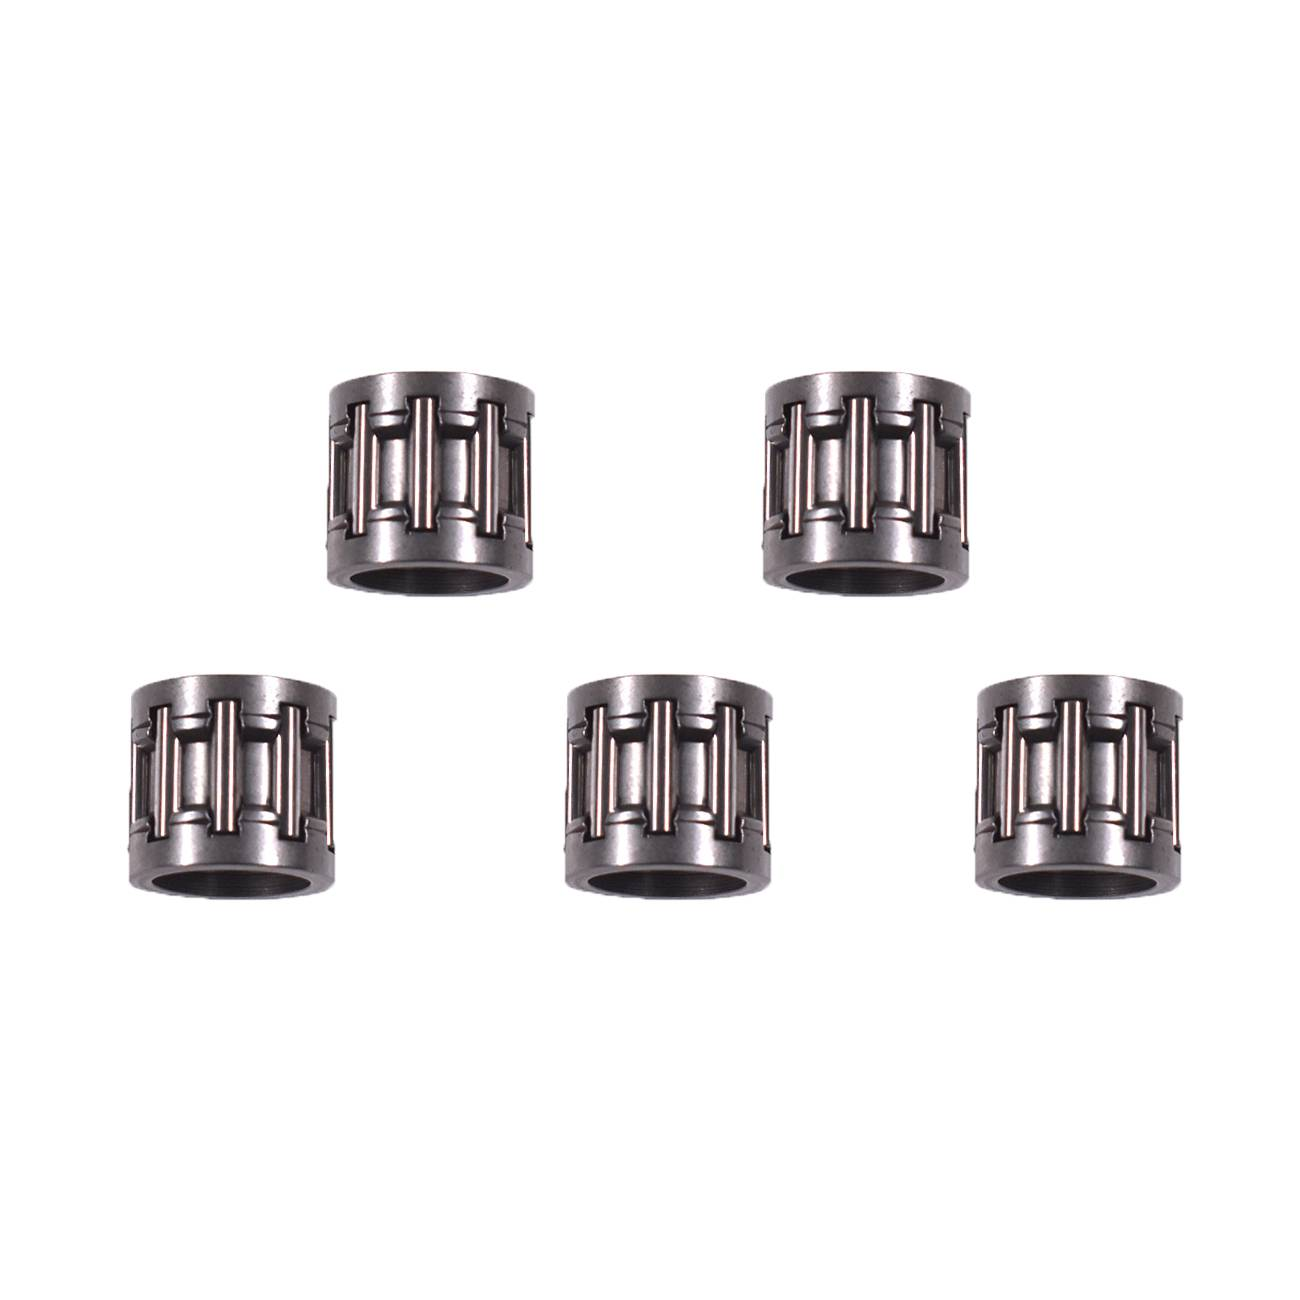 5X Piston Pin Bearing For STIHL FS220 220K 280 280K FS360 FS410 FS420 10*14*13